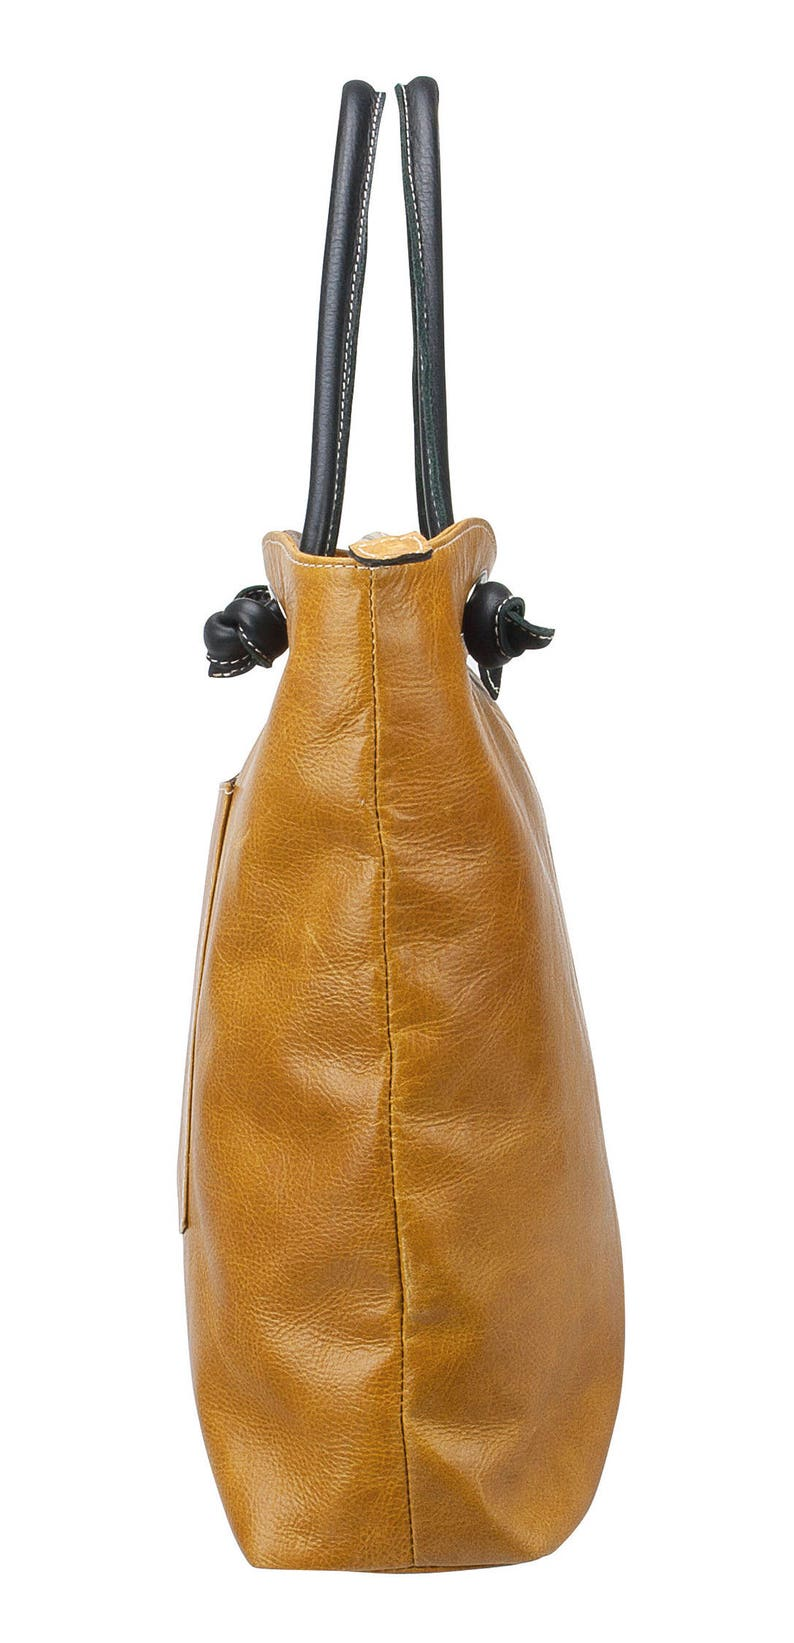 641d2c161f Ordinateur portable sac oversize marron clair grand sac | Etsy